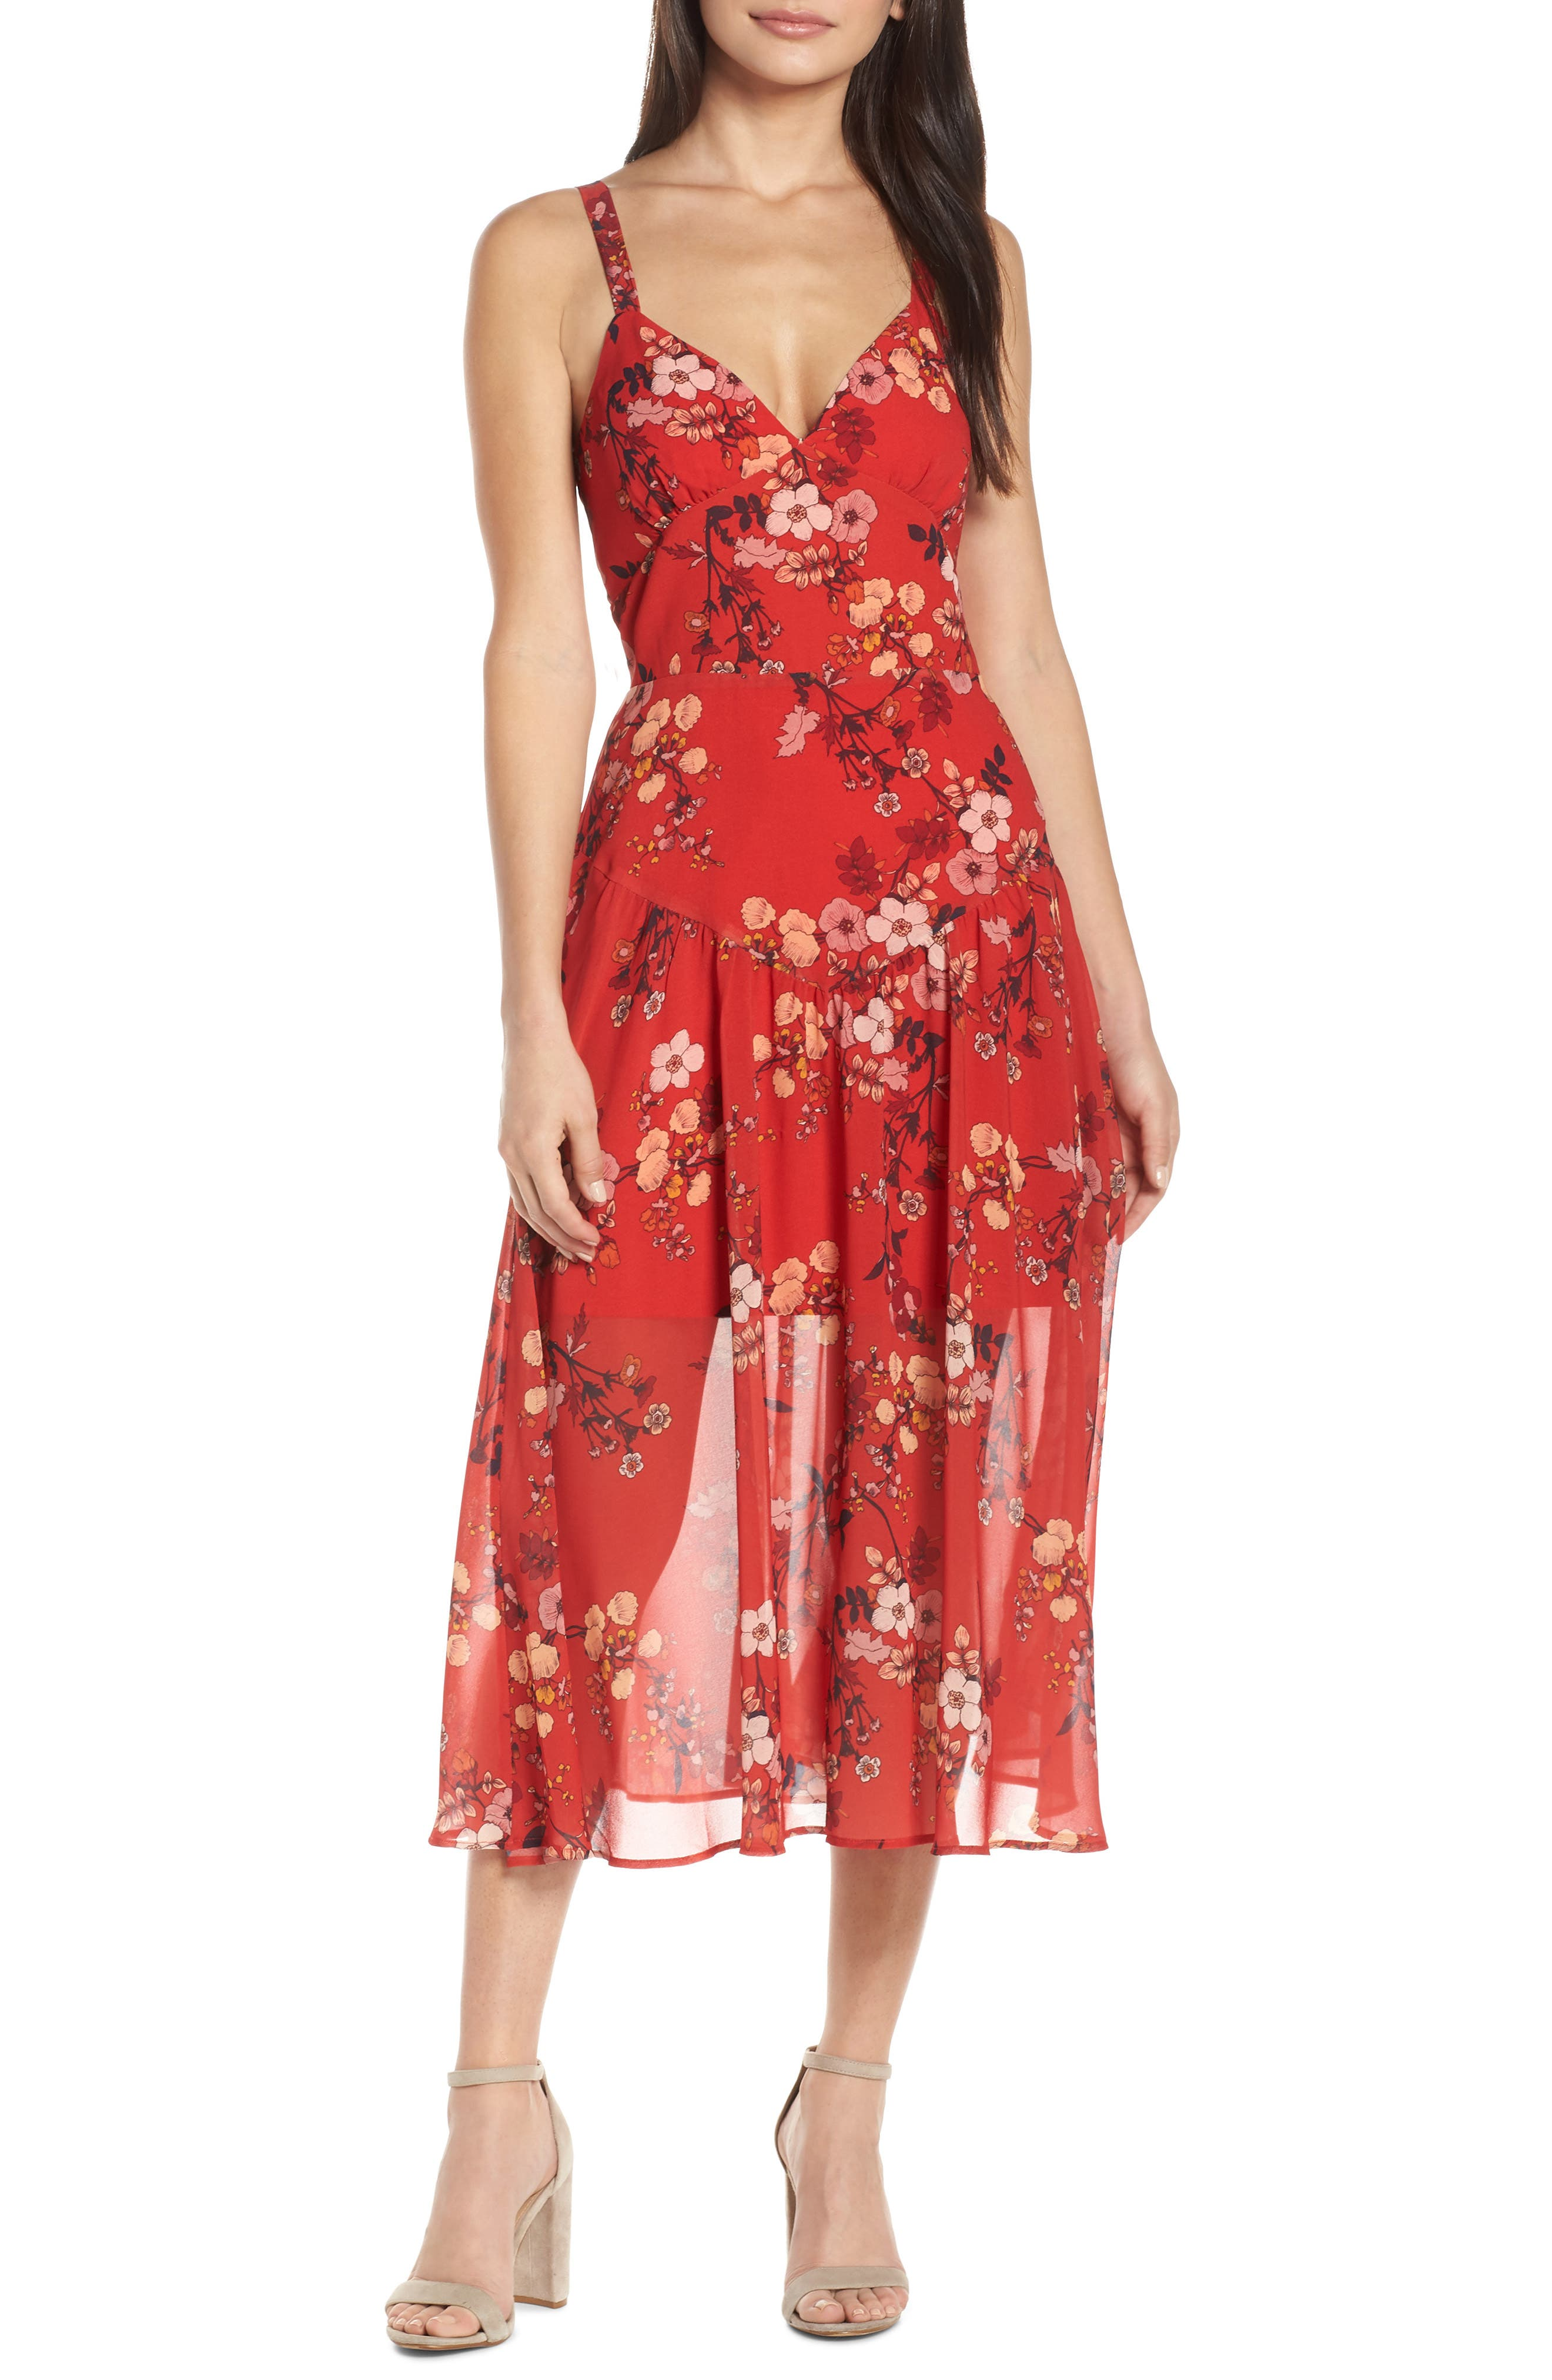 Cooper St Disco Floral Print Midi Dress, Red